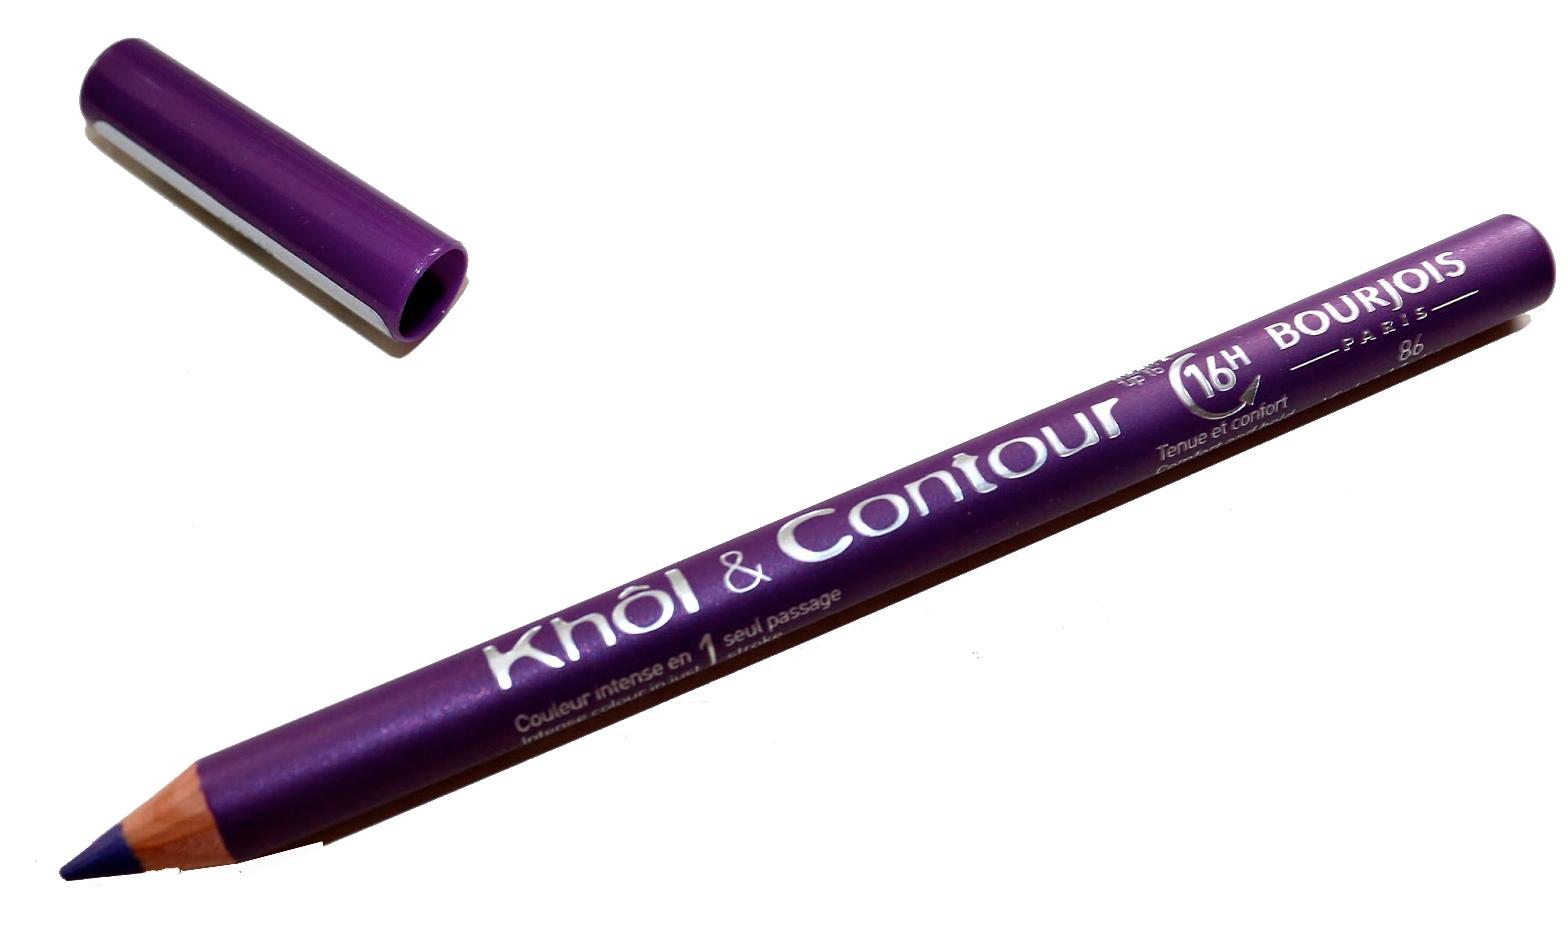 Bourjois Khol & Contour 16h Eyeliner Pencil - 86 Violet Malicieu